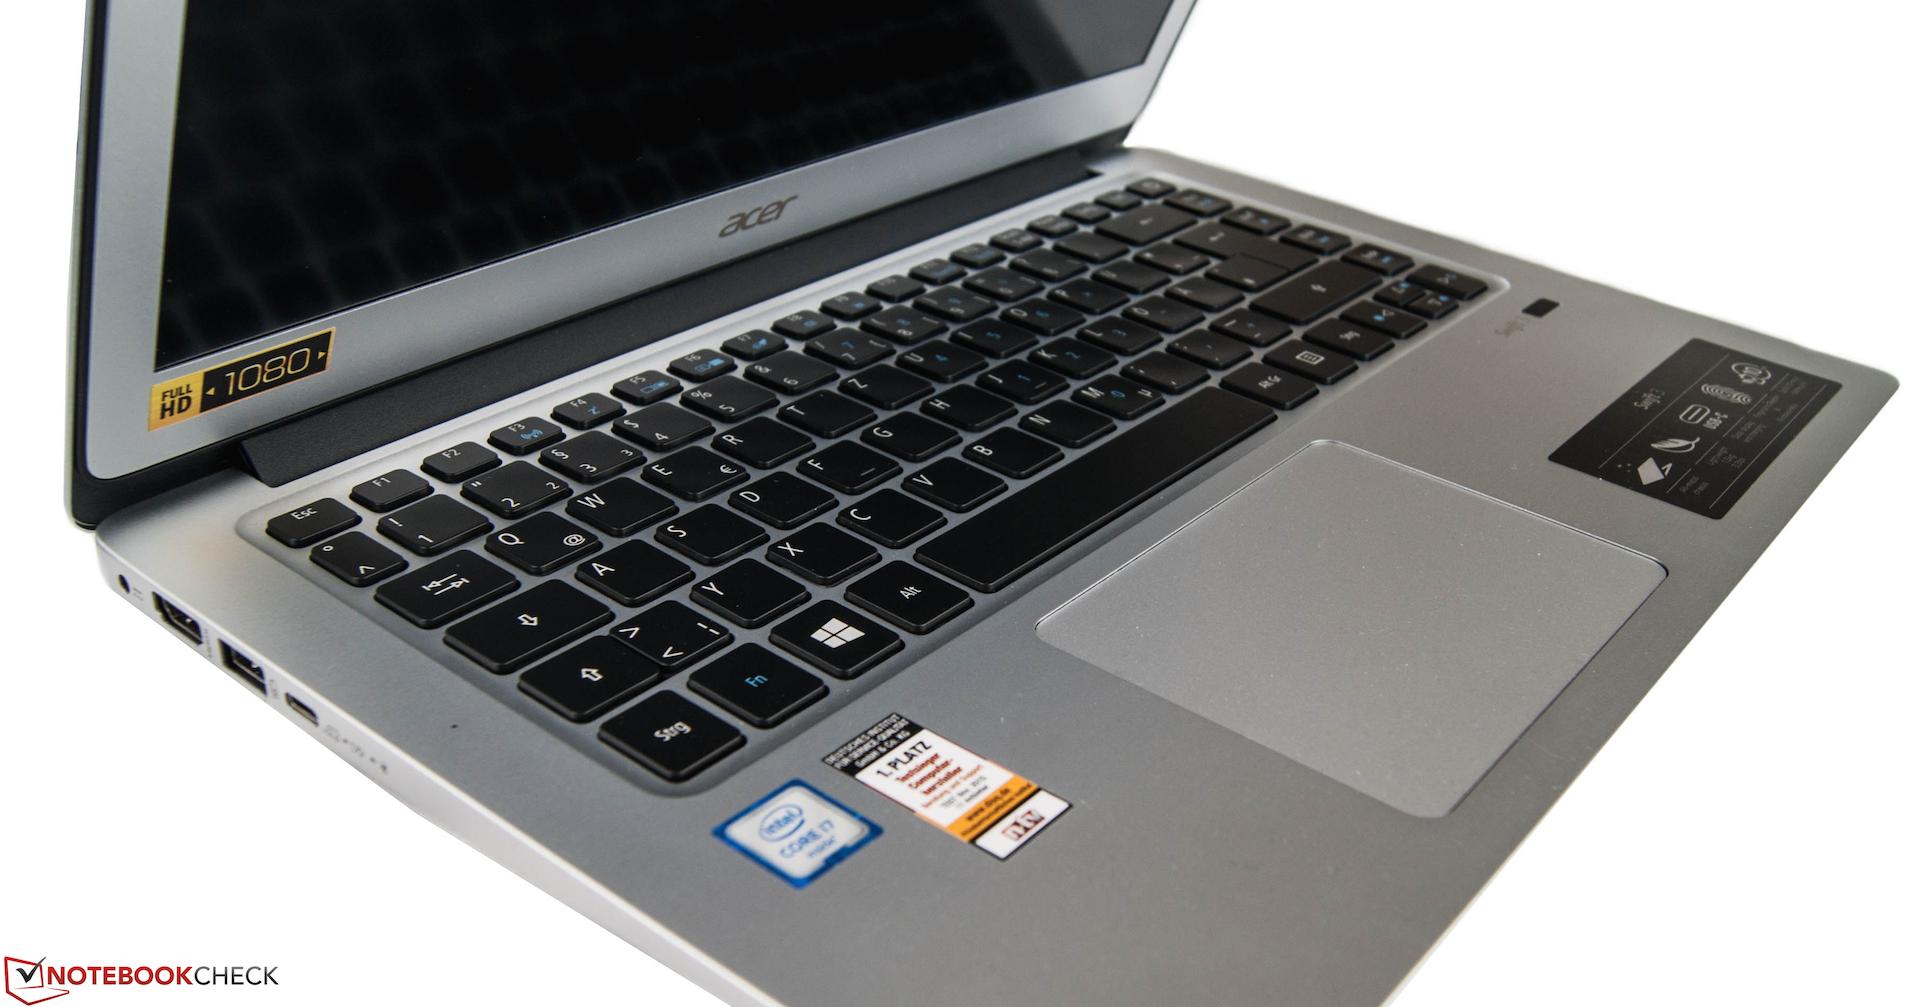 Acer Swift 3 SF314-51-731X Notebook Review - NotebookCheck.net Reviews